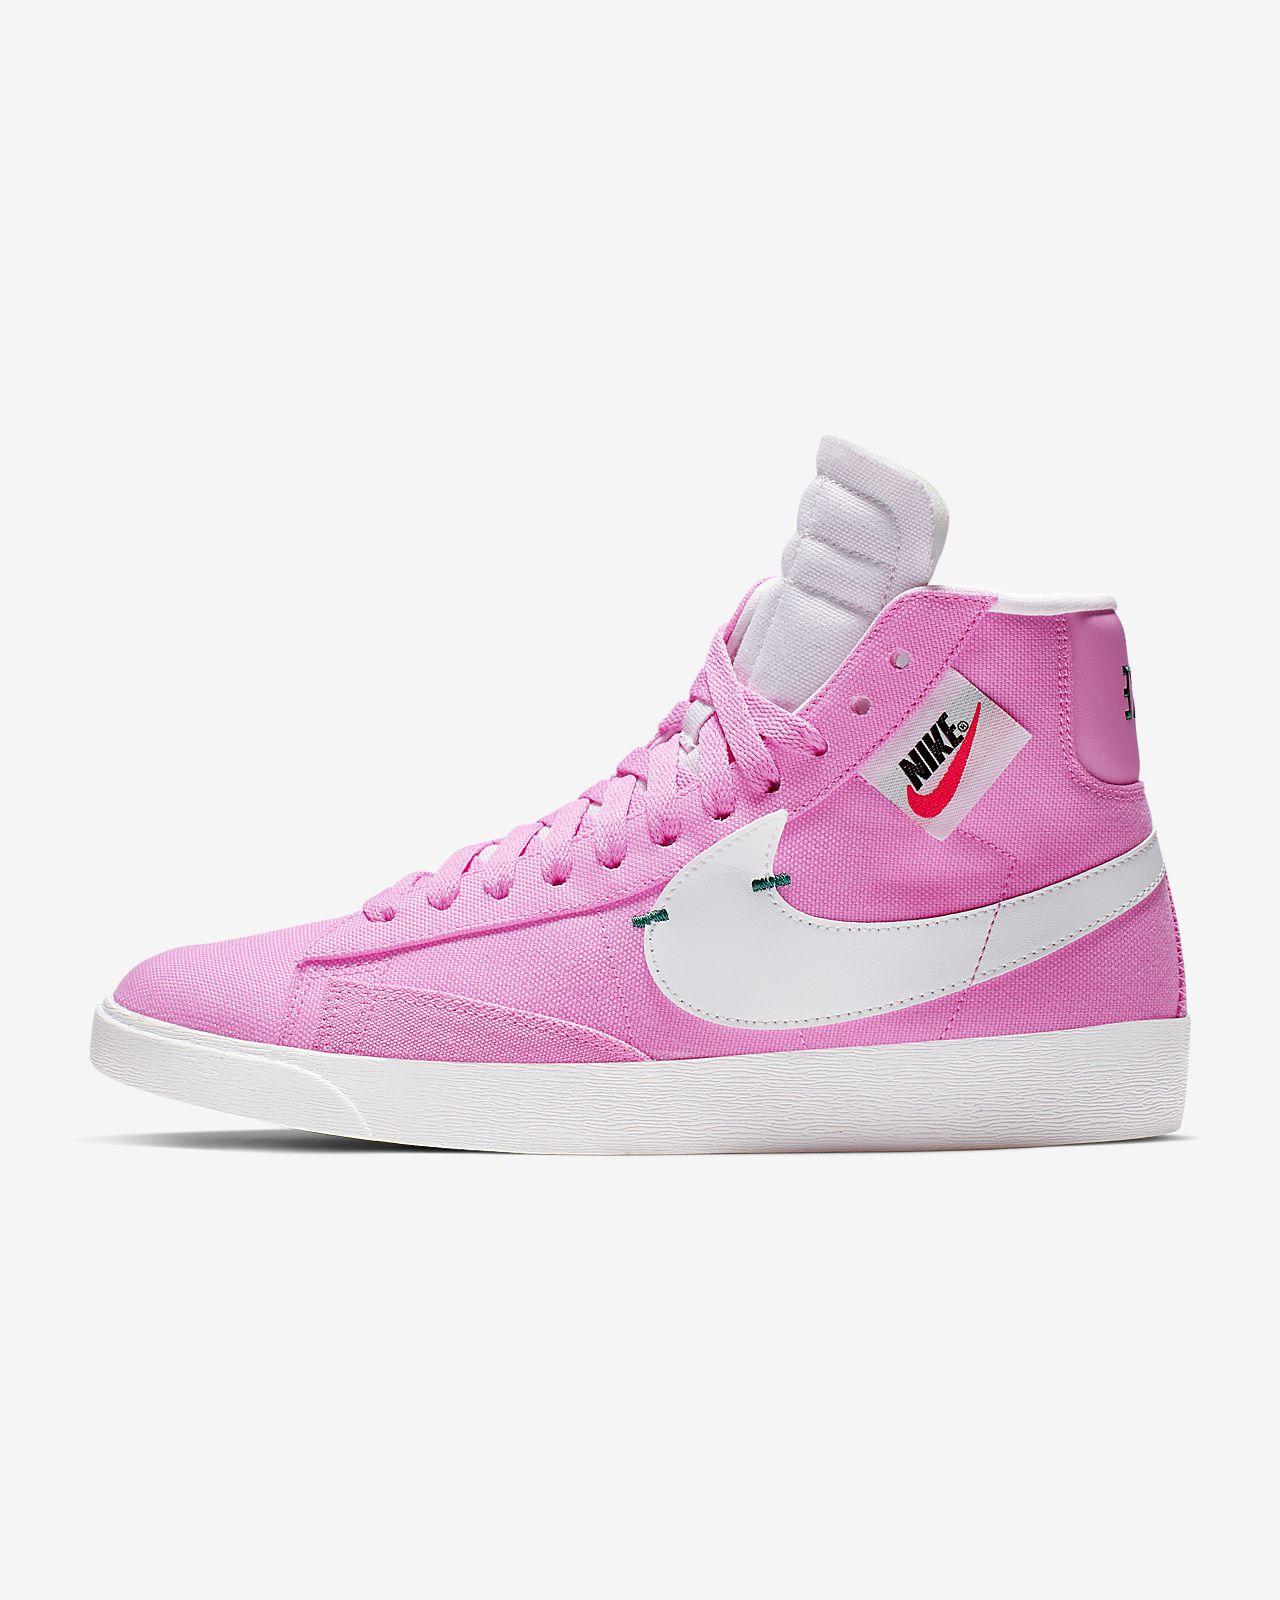 Nike Blazer Mid Rebel Damenschuh